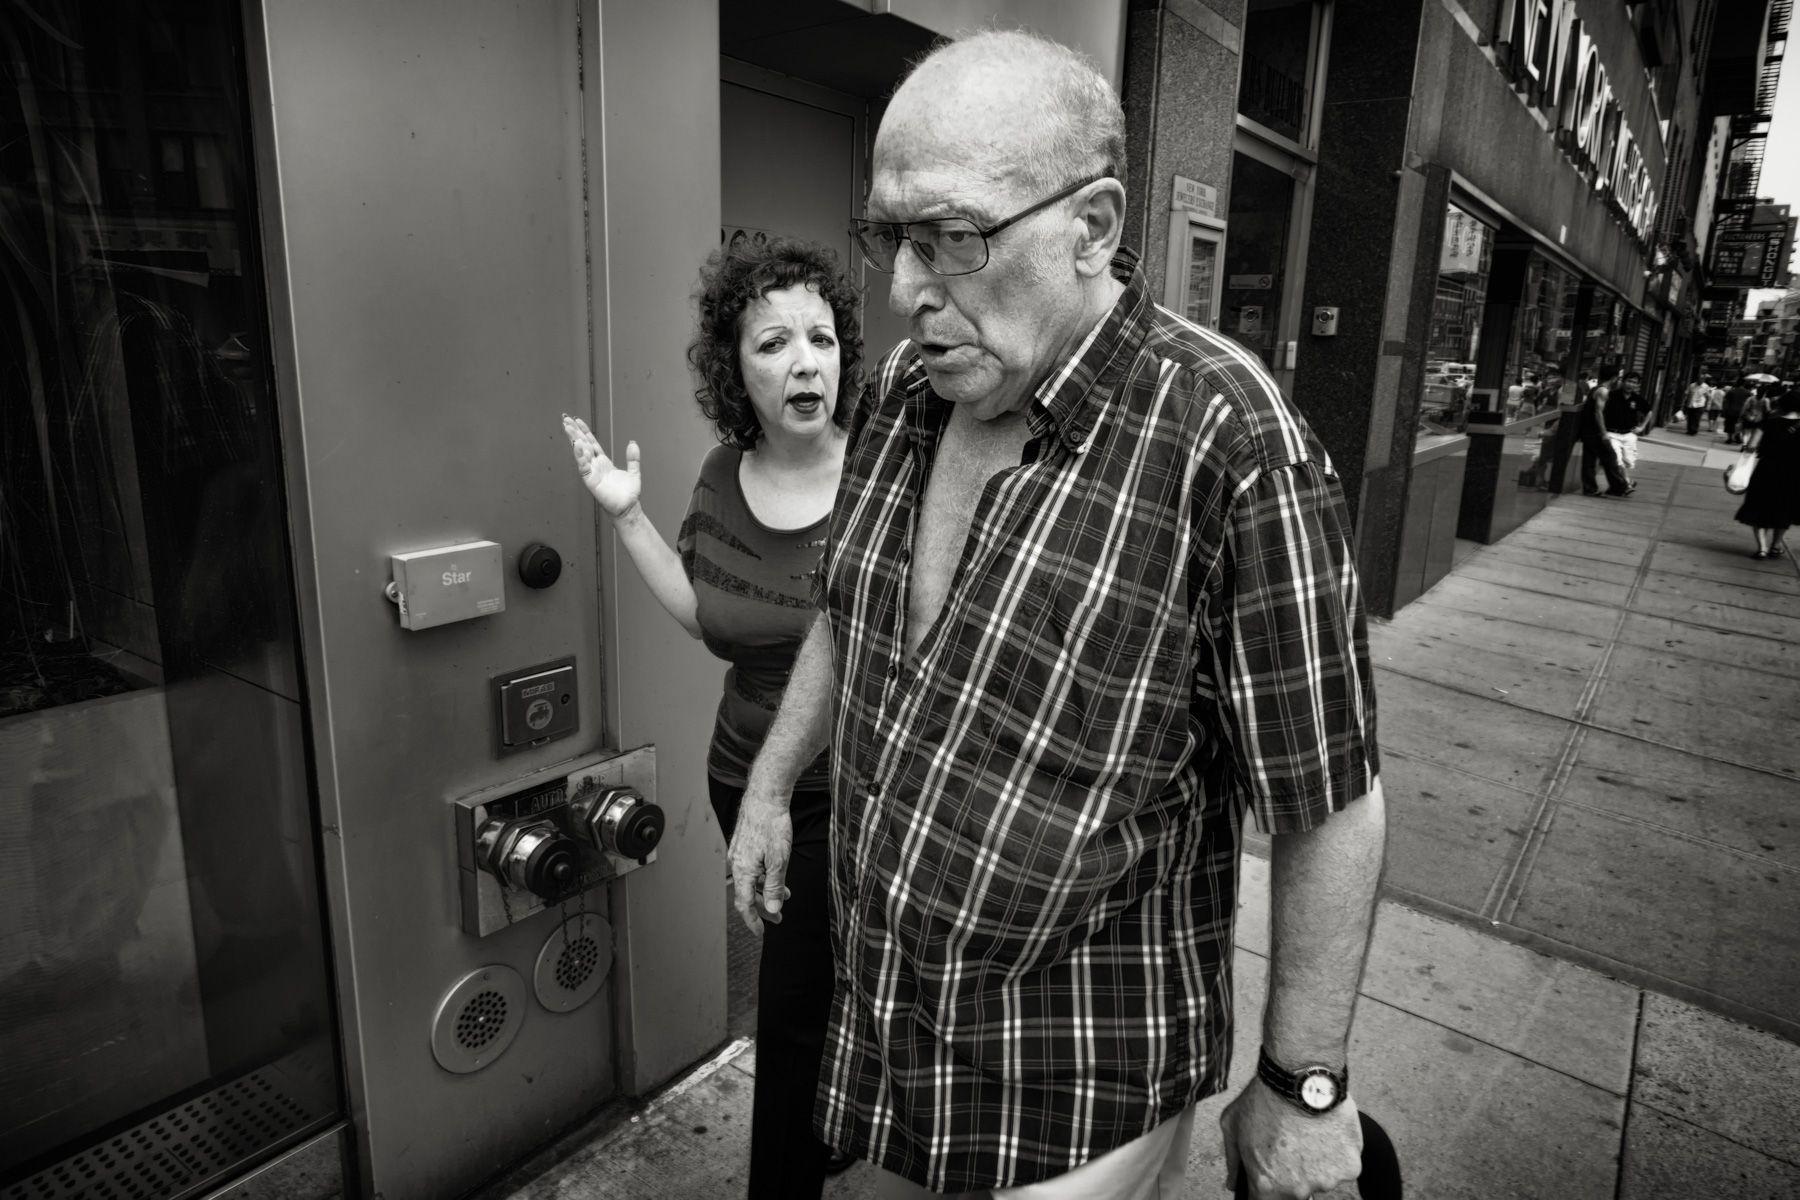 Manhattan, New York  07/214/13